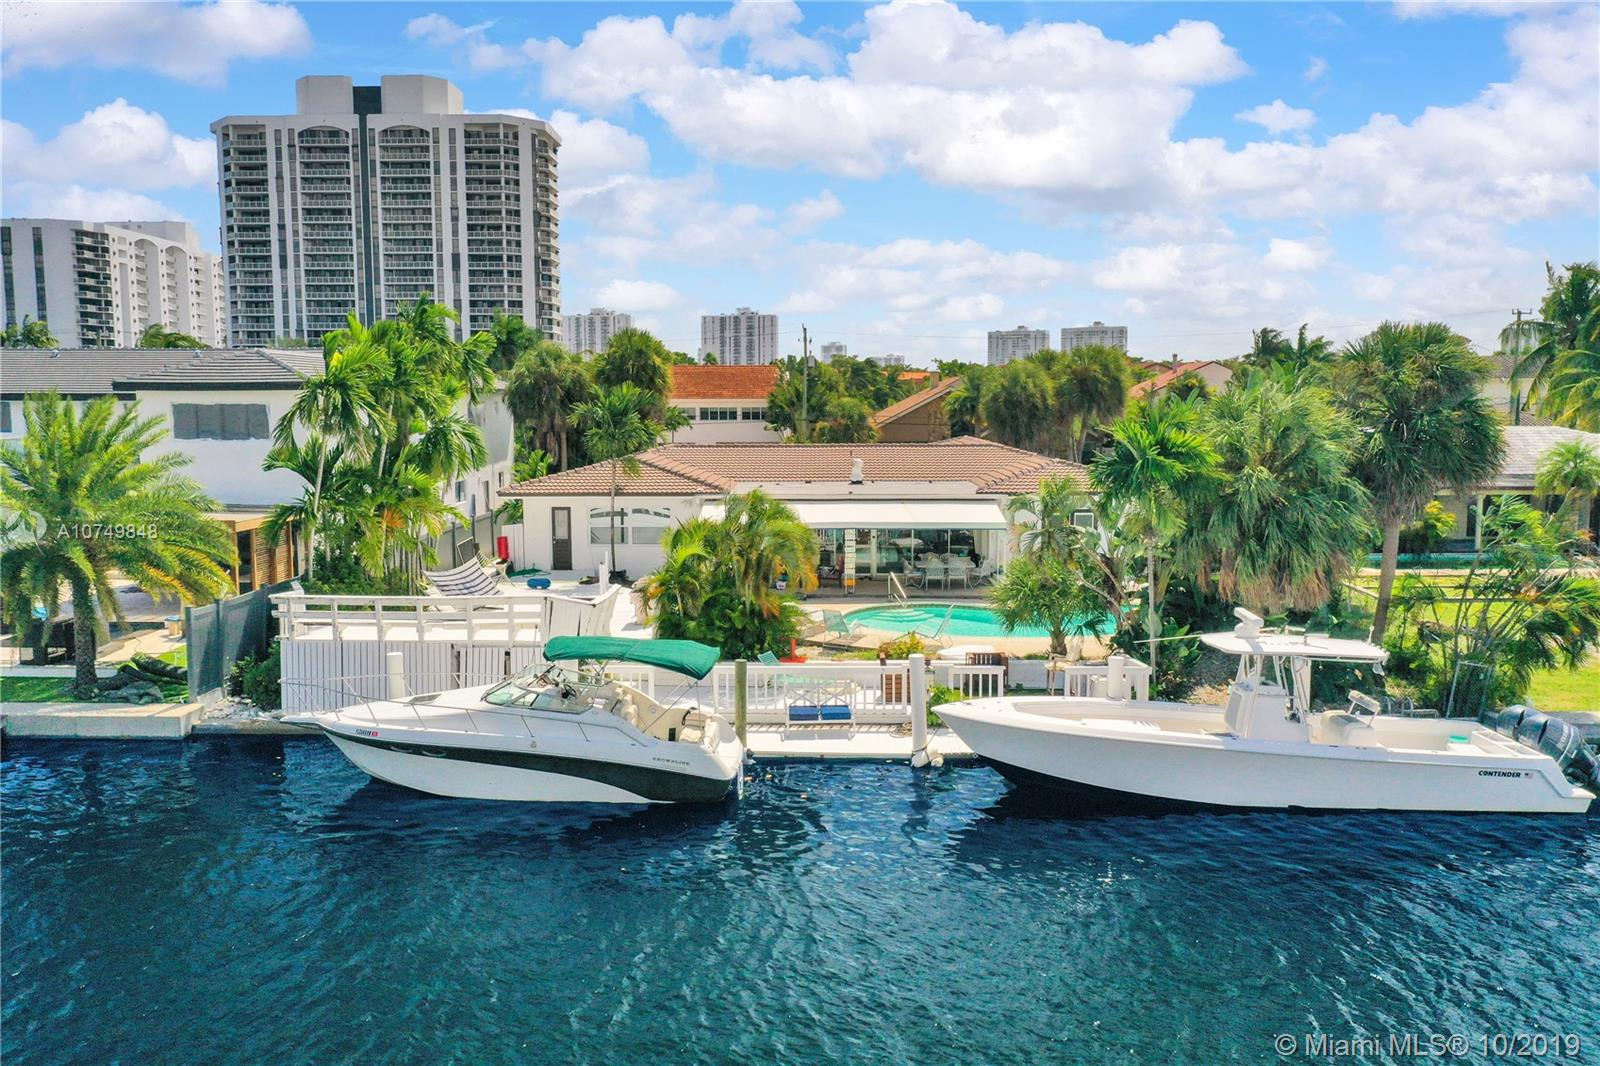 Golden Isles, 460 Holiday Dr, Hallandale Beach, Florida 33009